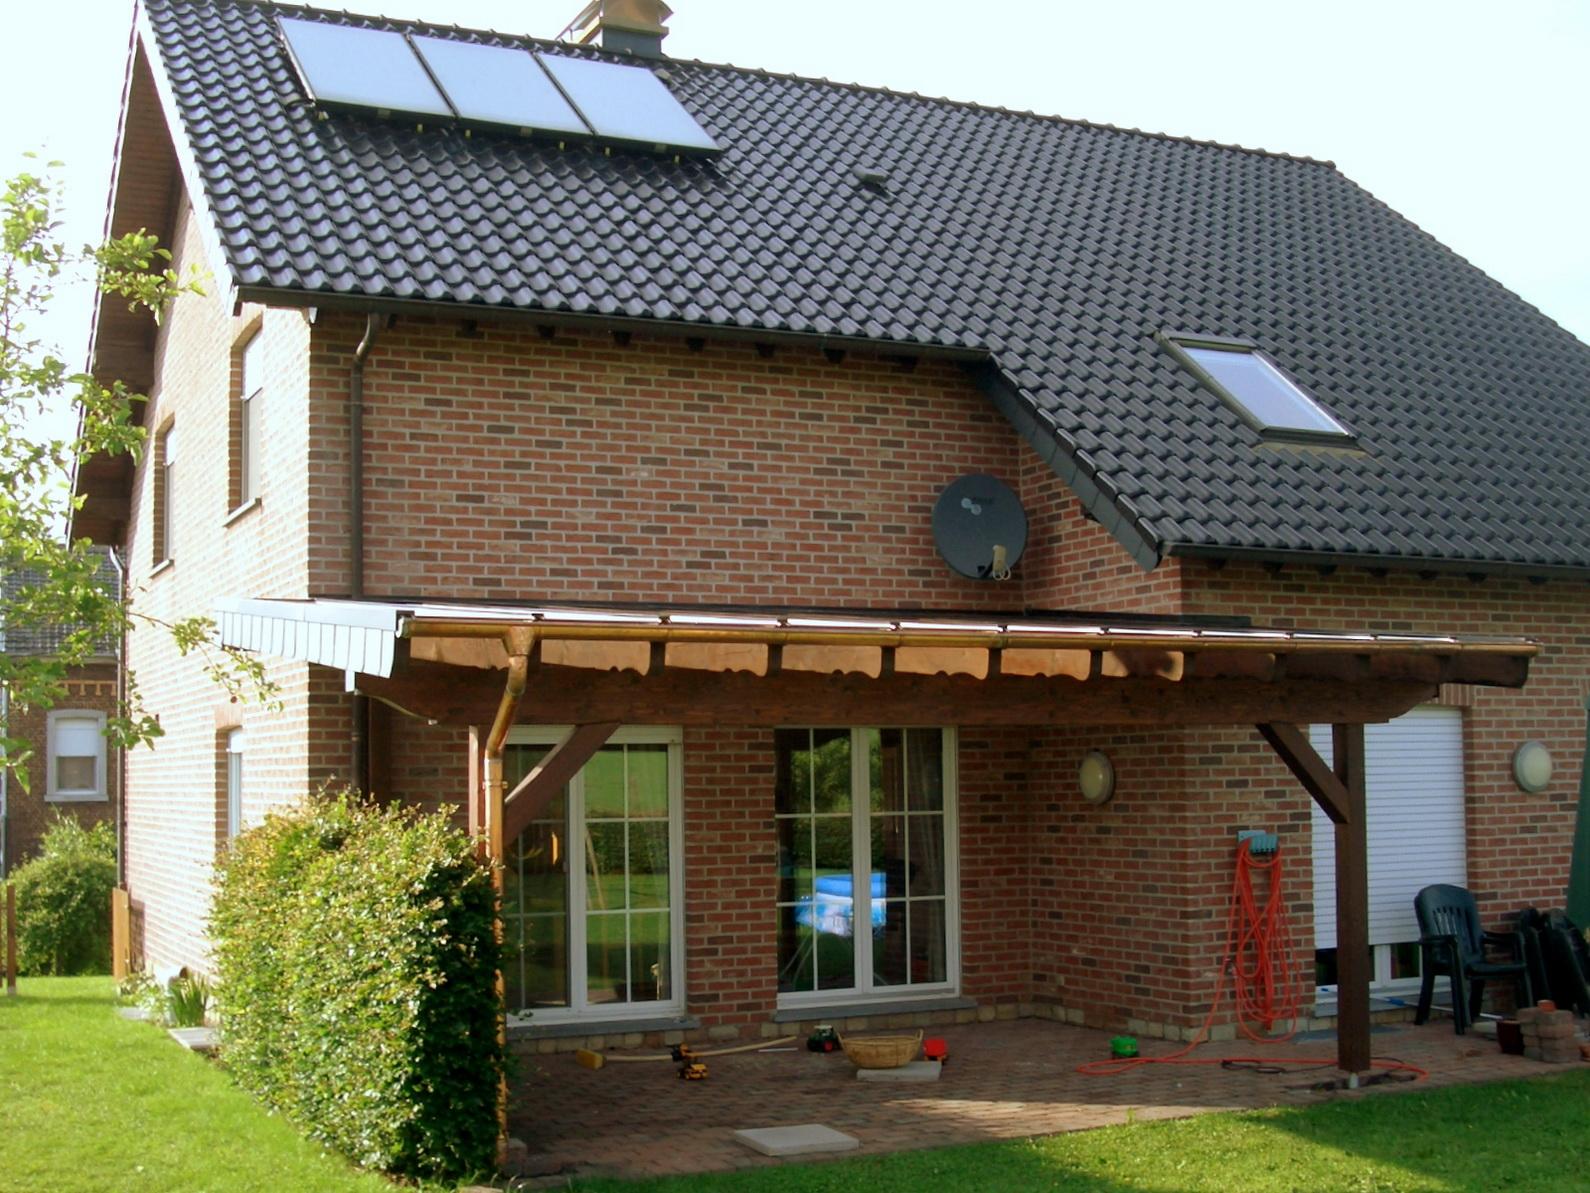 Pergola 39 s hedach ag houtconstructies voor dak en wand - Pergola dakbedekking ...